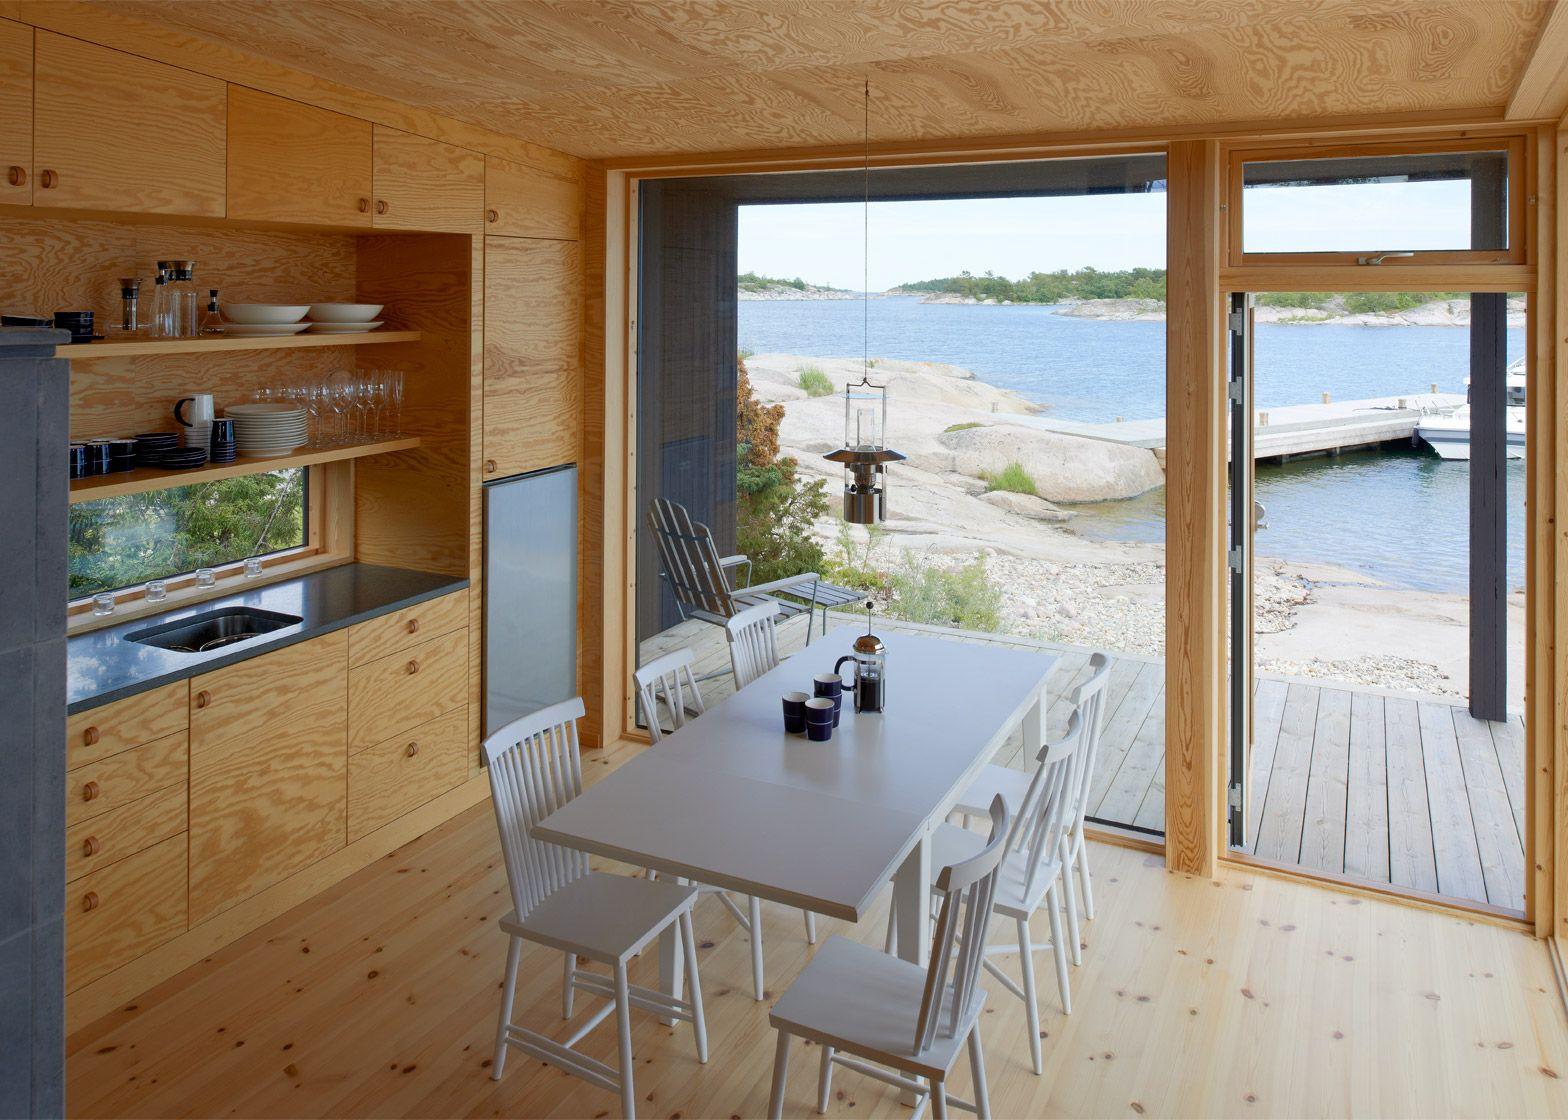 Swedish Homes Blackened Timber Holiday Homes Modelled On Swedish Fishing Huts